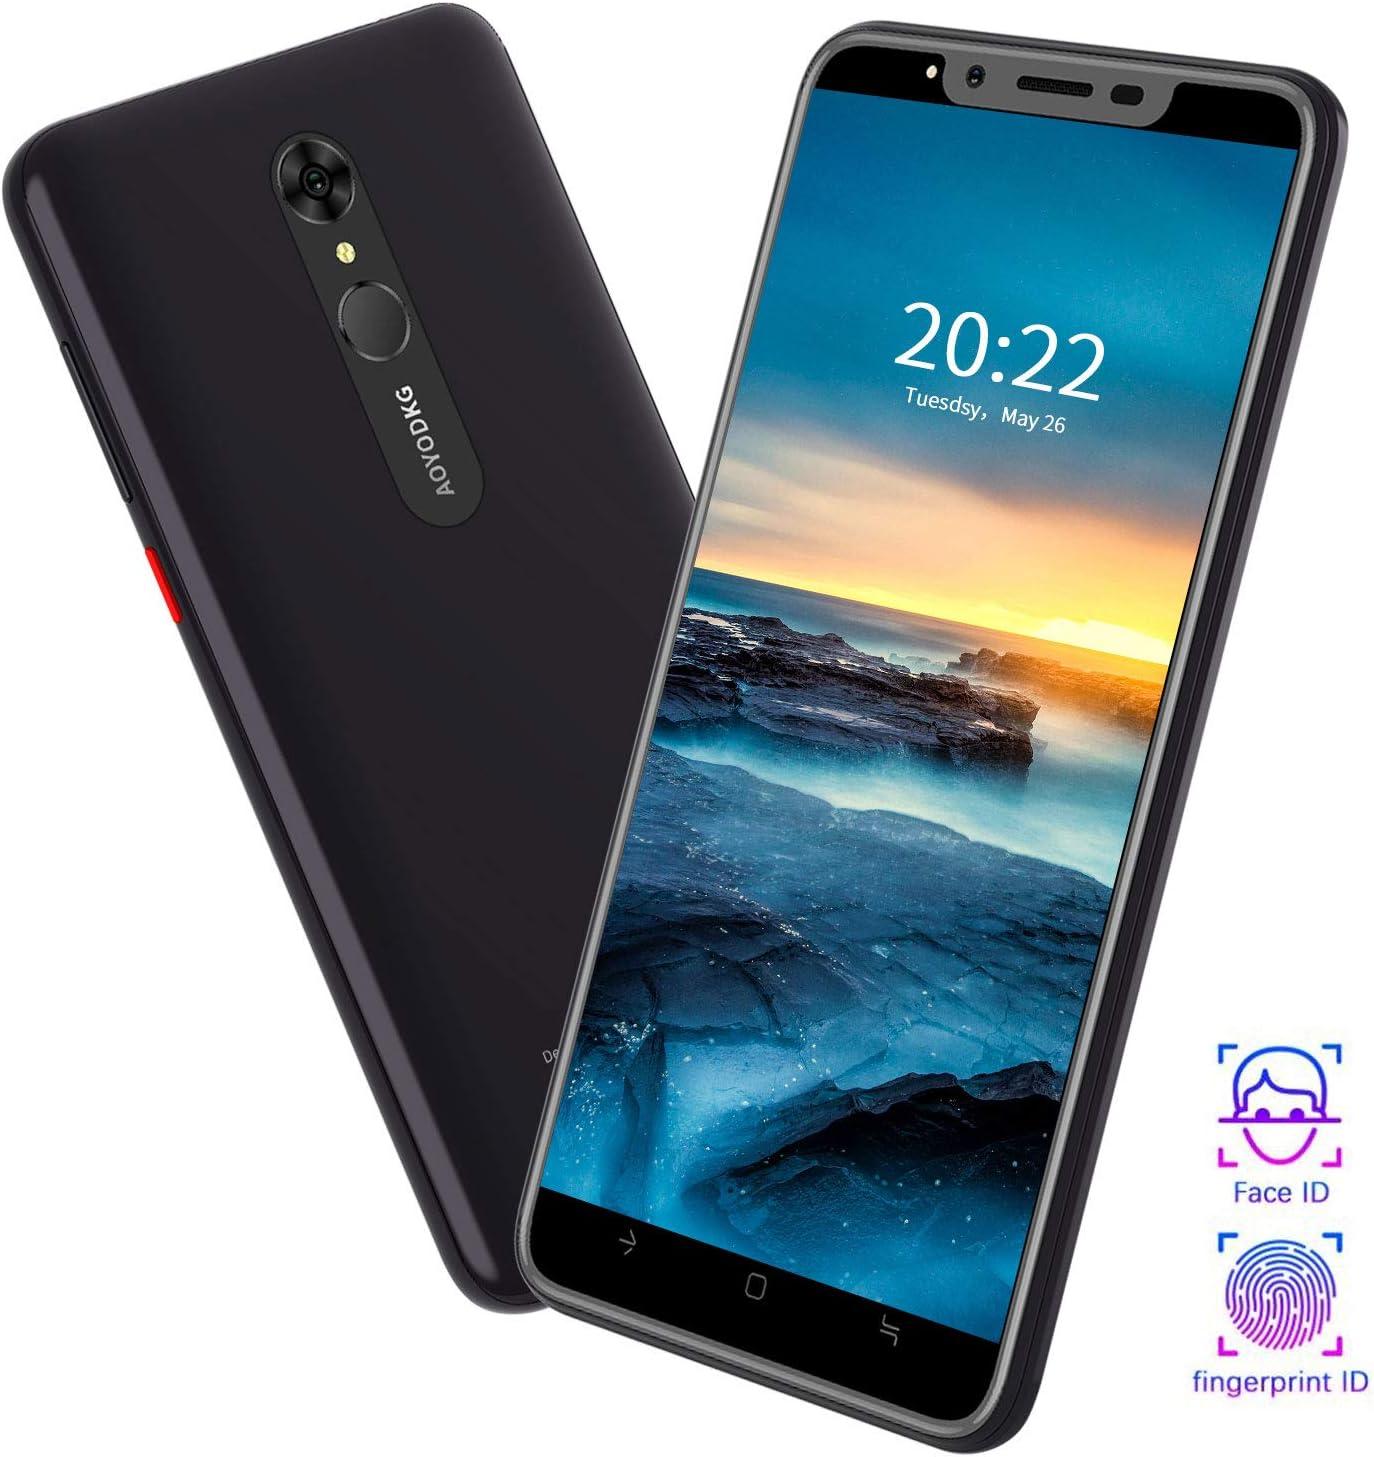 Moviles Libres 4G 5.5 Pulgadas 8MP+5MP Fingerprint Unlock 1GB RAM 16GB ROM/Extendida 128GB Telefono movil 4800mAh Bateria, Dual SIM Móviles y Smartphone Libres Android 9.0